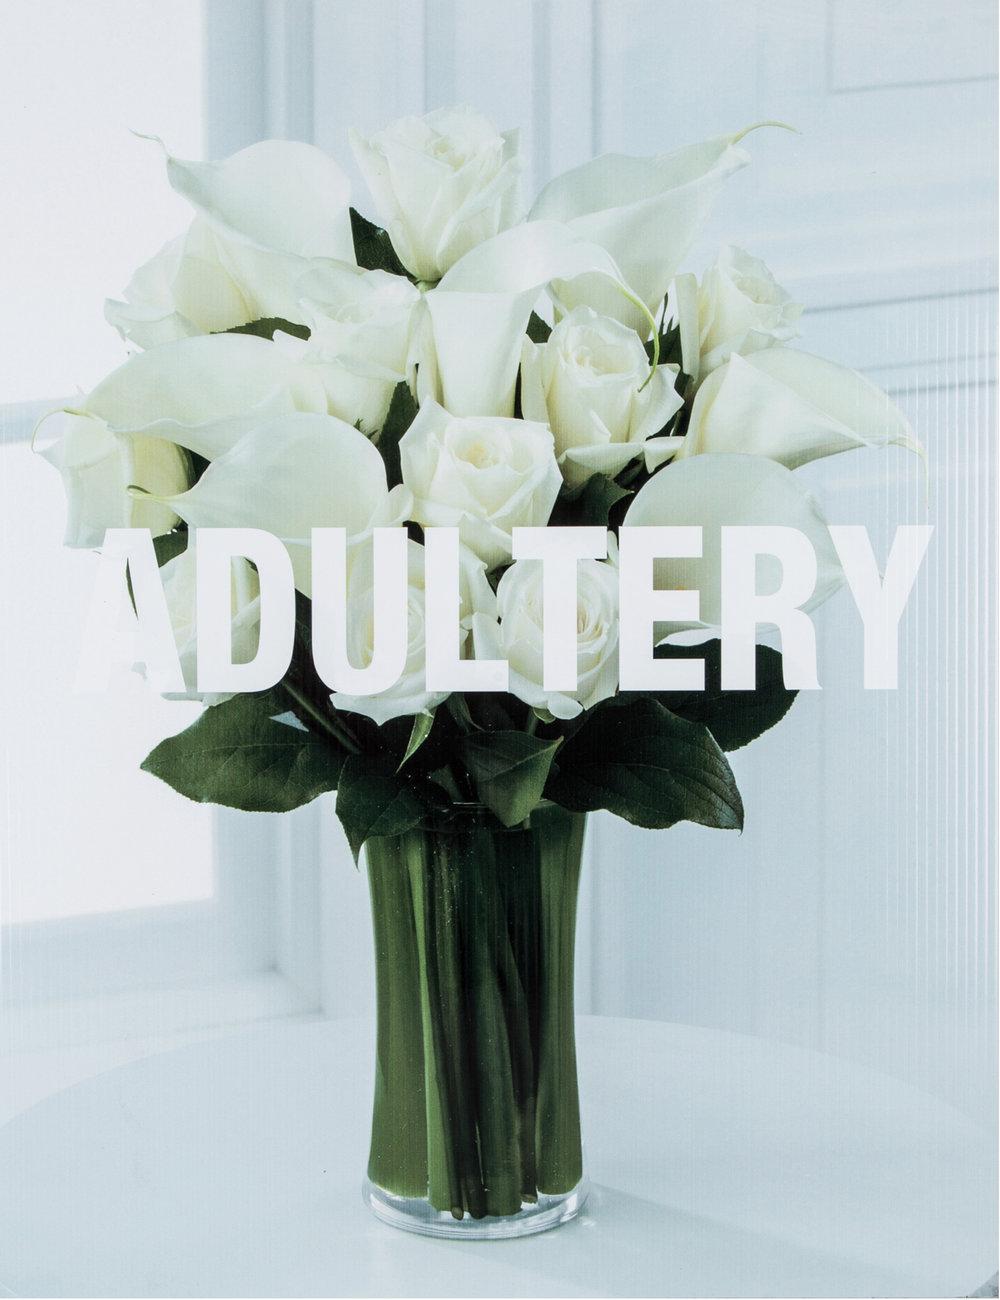 cali-dewitt-adultery-2.jpg